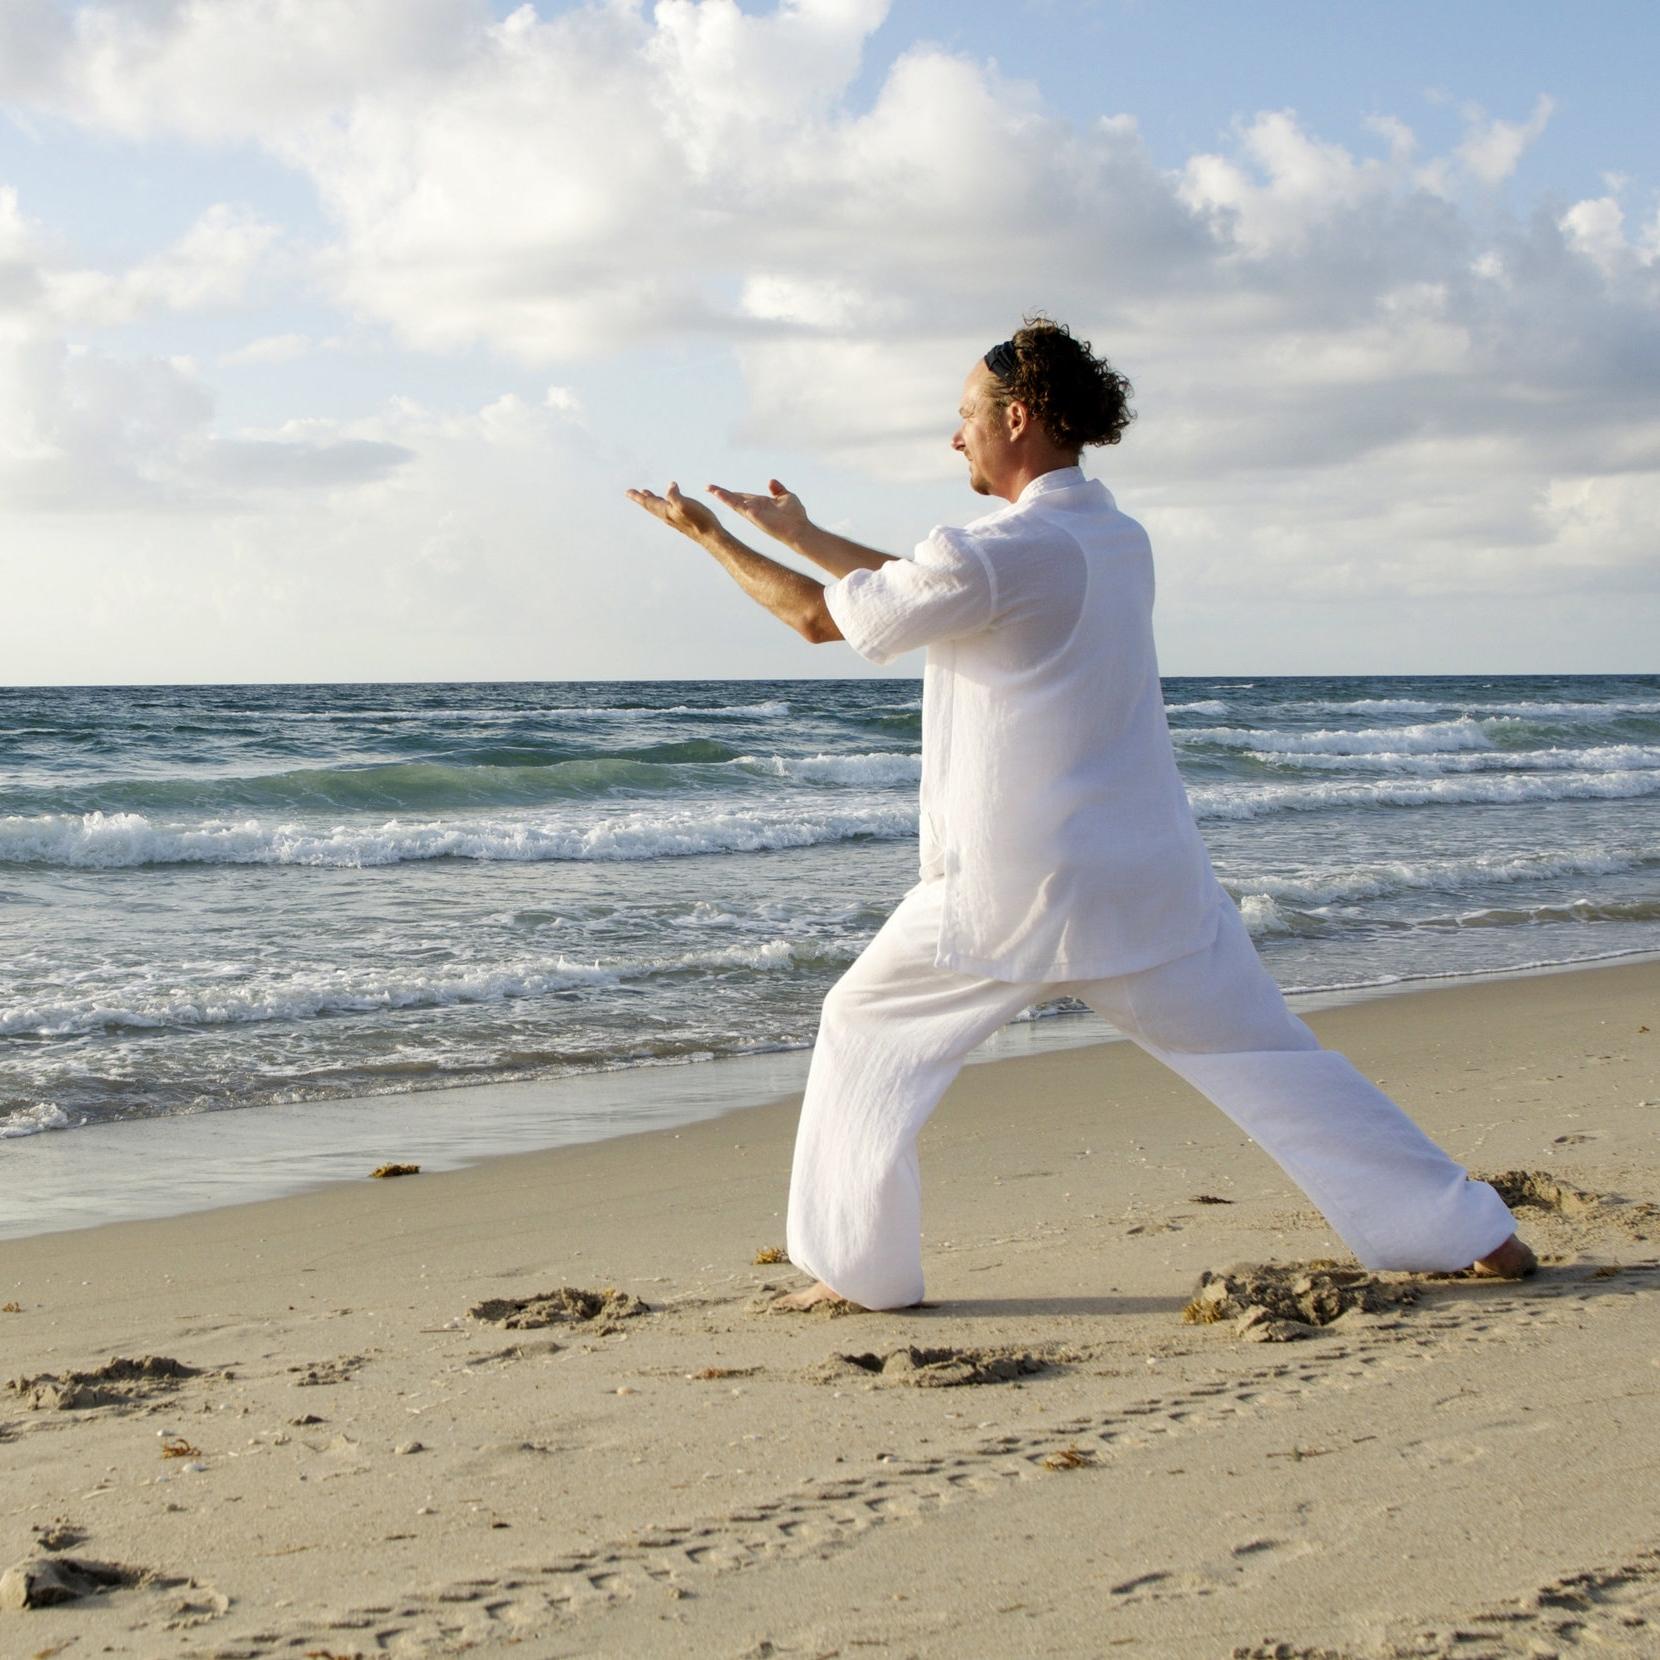 man-dressed-in-white-praticing-tai-chi-on-beasch.jpg